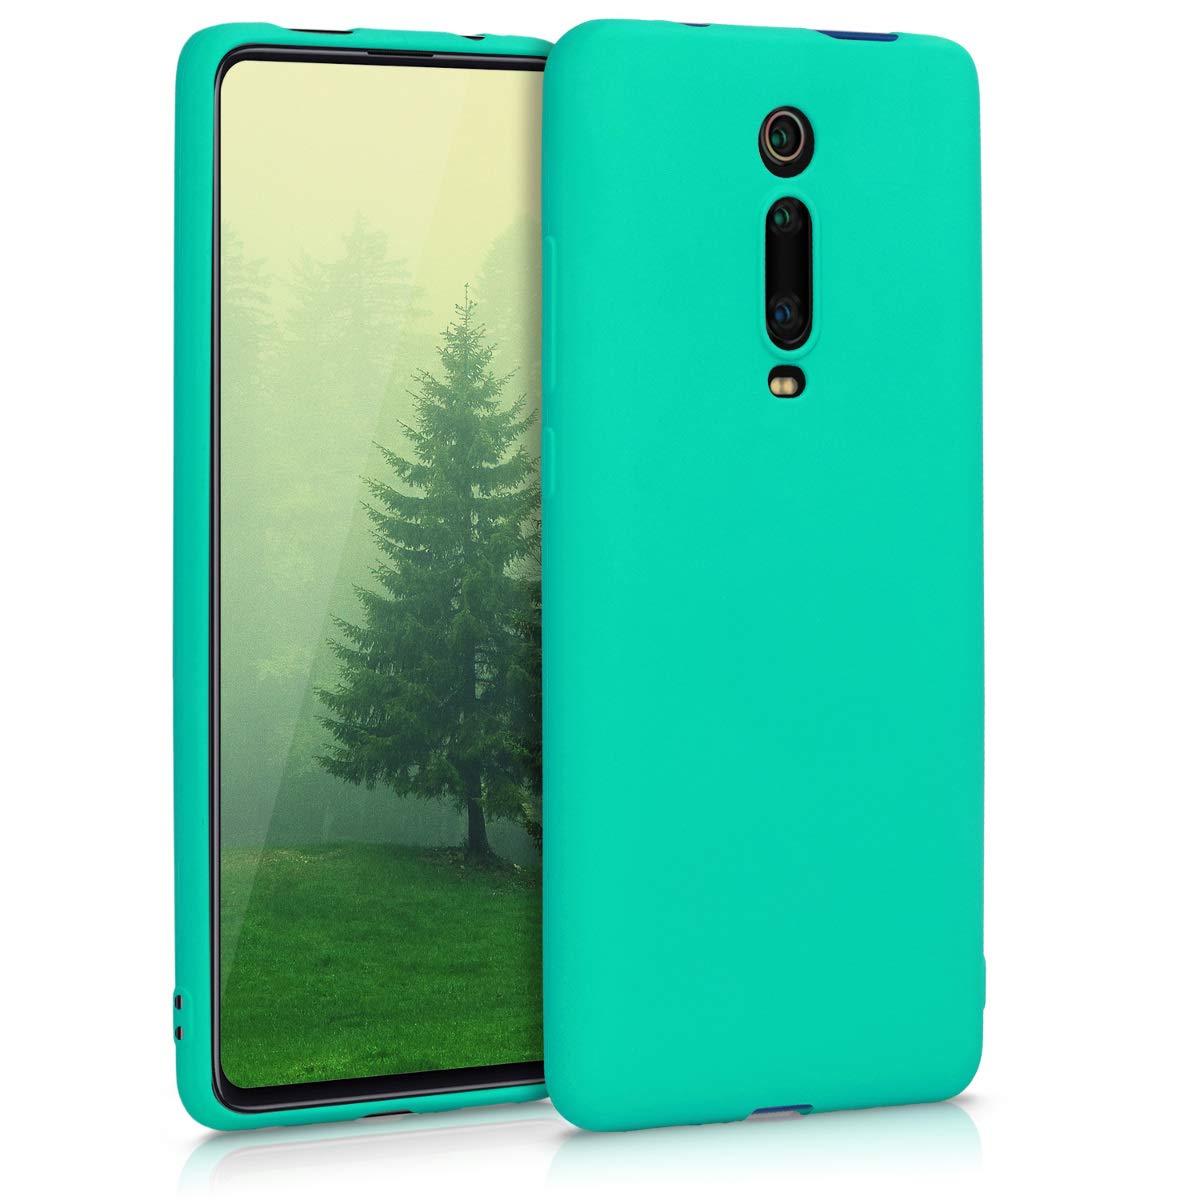 Funda De Silicona Para Xiaomi Mi 9t Pro Turquesa Kwmobile